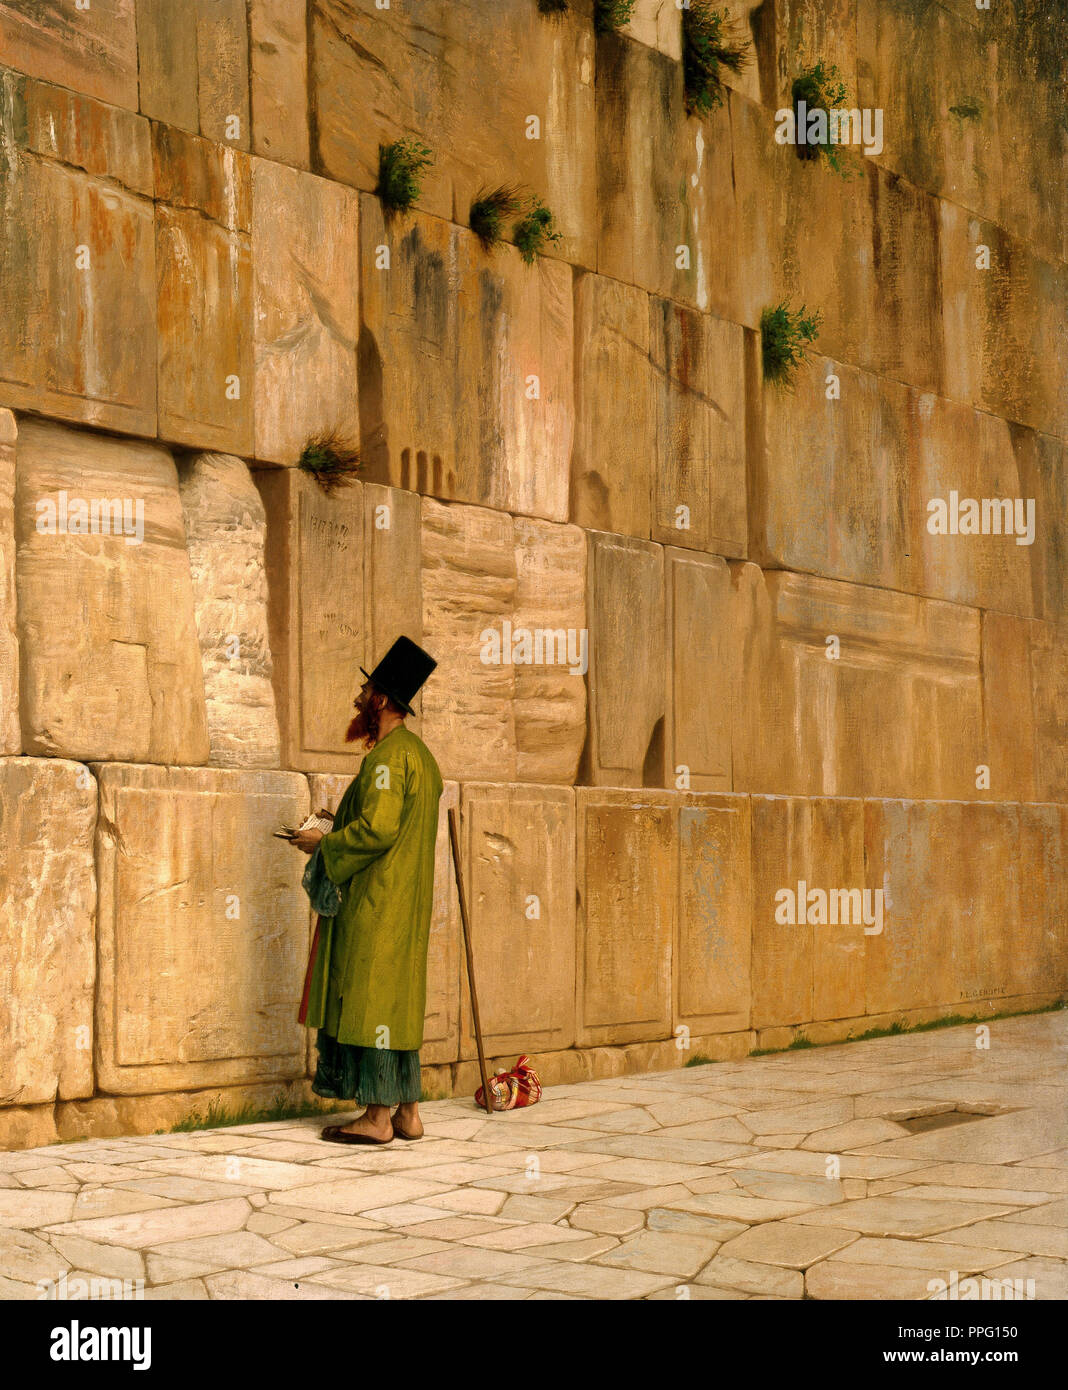 Jean-Leon Gerome, The Wailing Wall 1880 Oil on canvas. Israel Museum, Jerusalem, Israel. - Stock Image